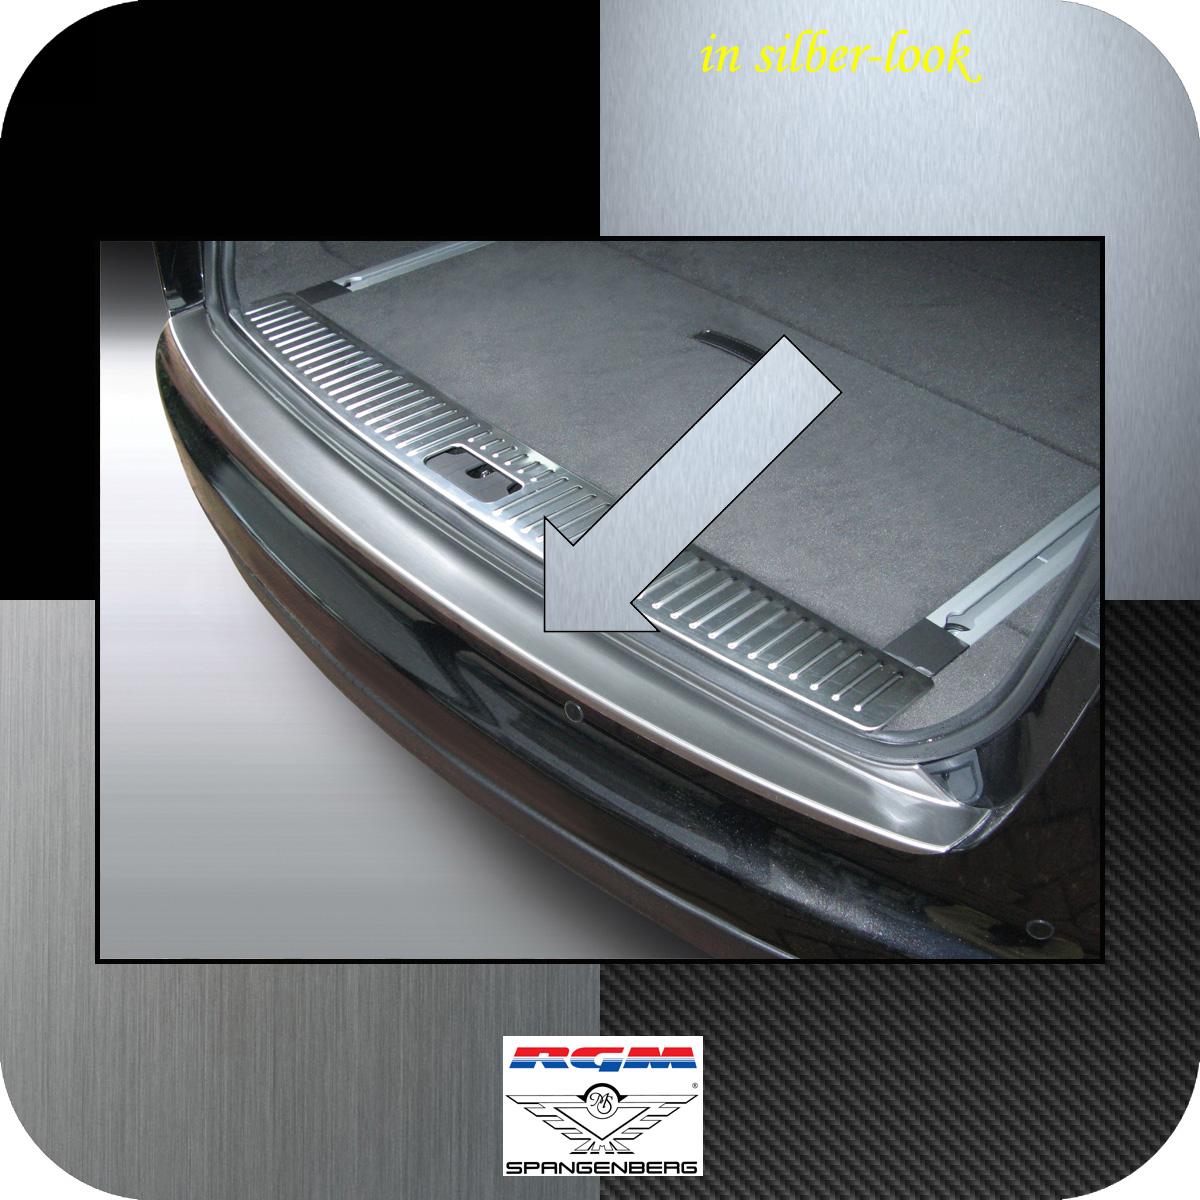 Ladekantenschutz Silber-Look Jaguar XF Sportbrake I X250 Kombi 2012-2014 3506608